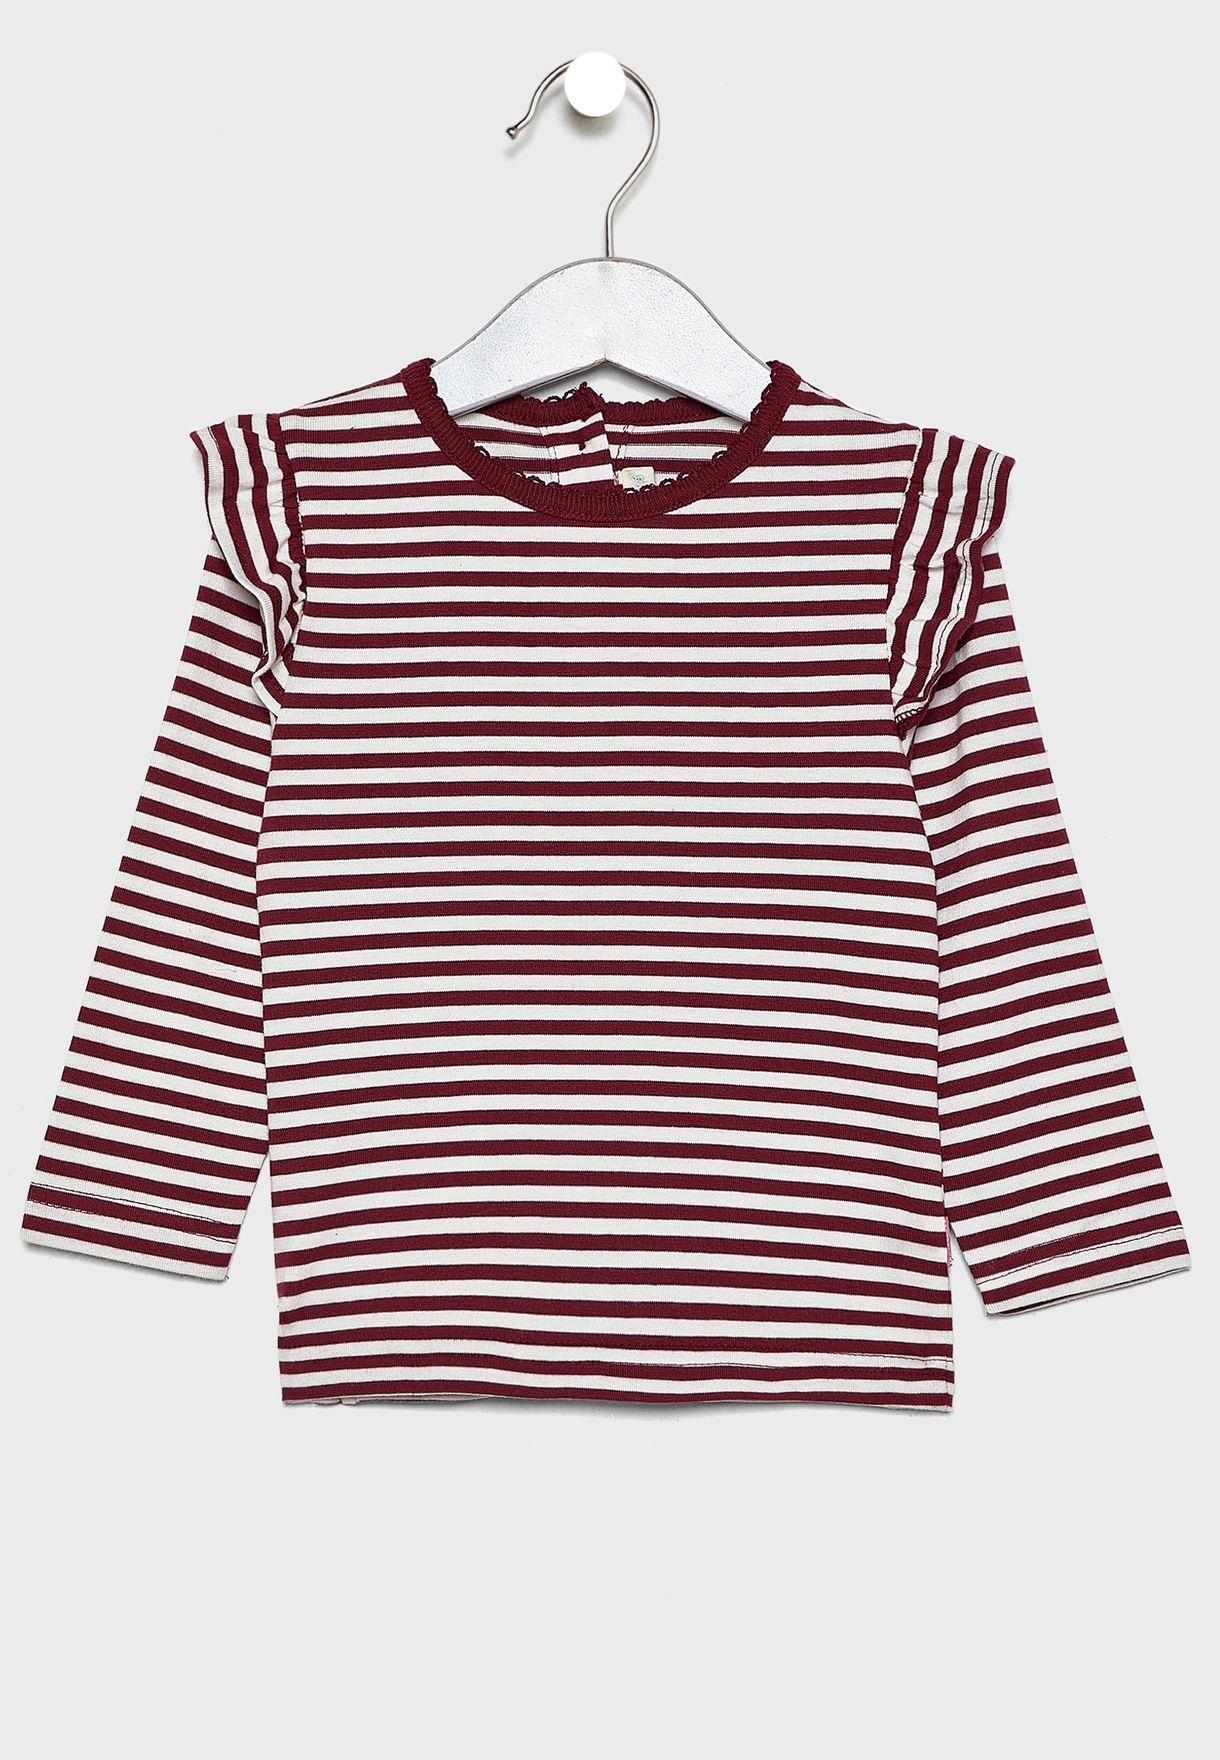 Kids Striped Top